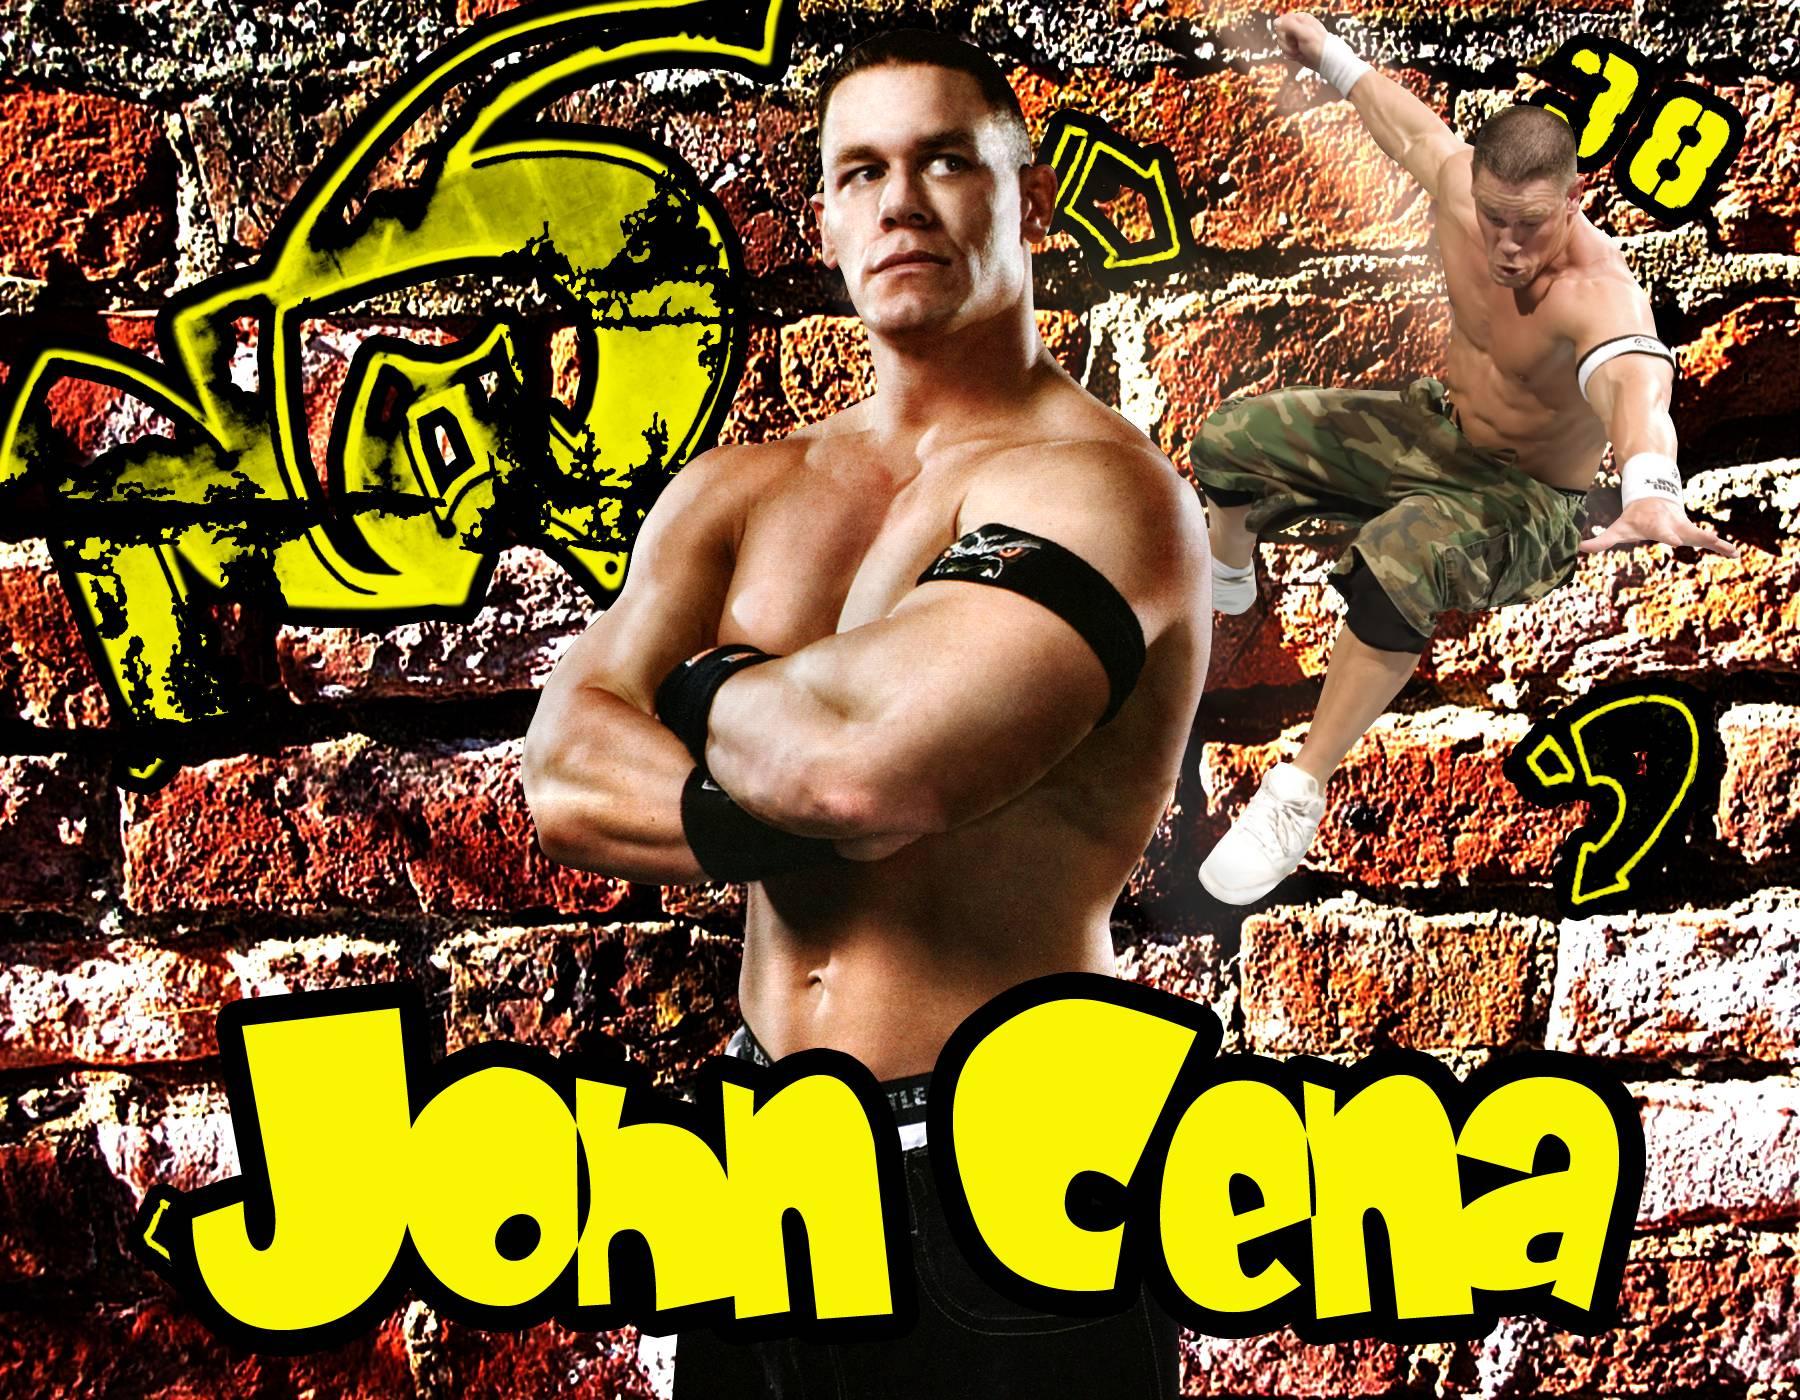 john cena backgrounds - wallpaper cave